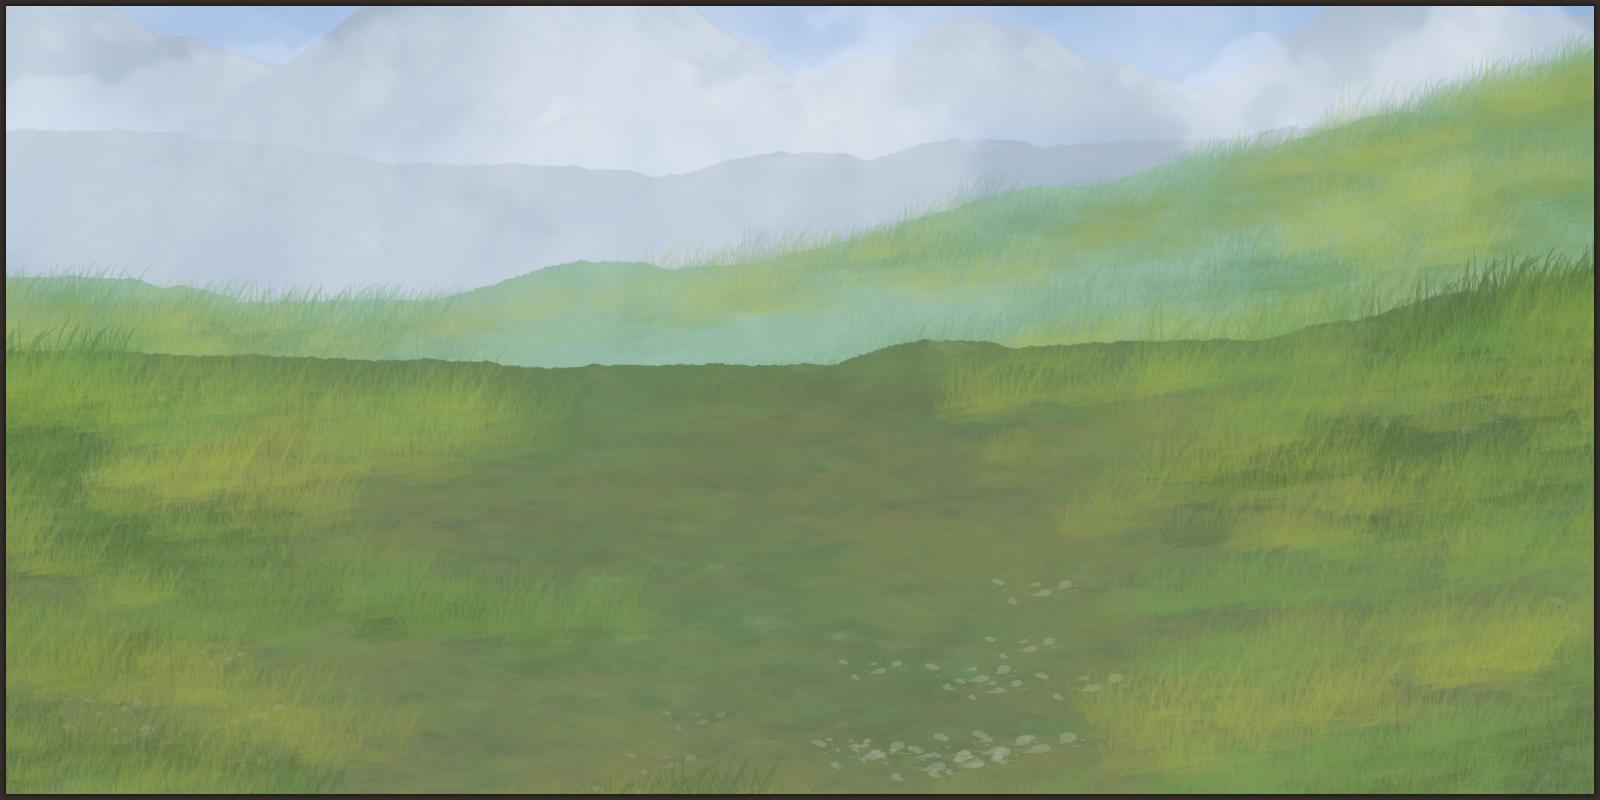 progress 9 - hills